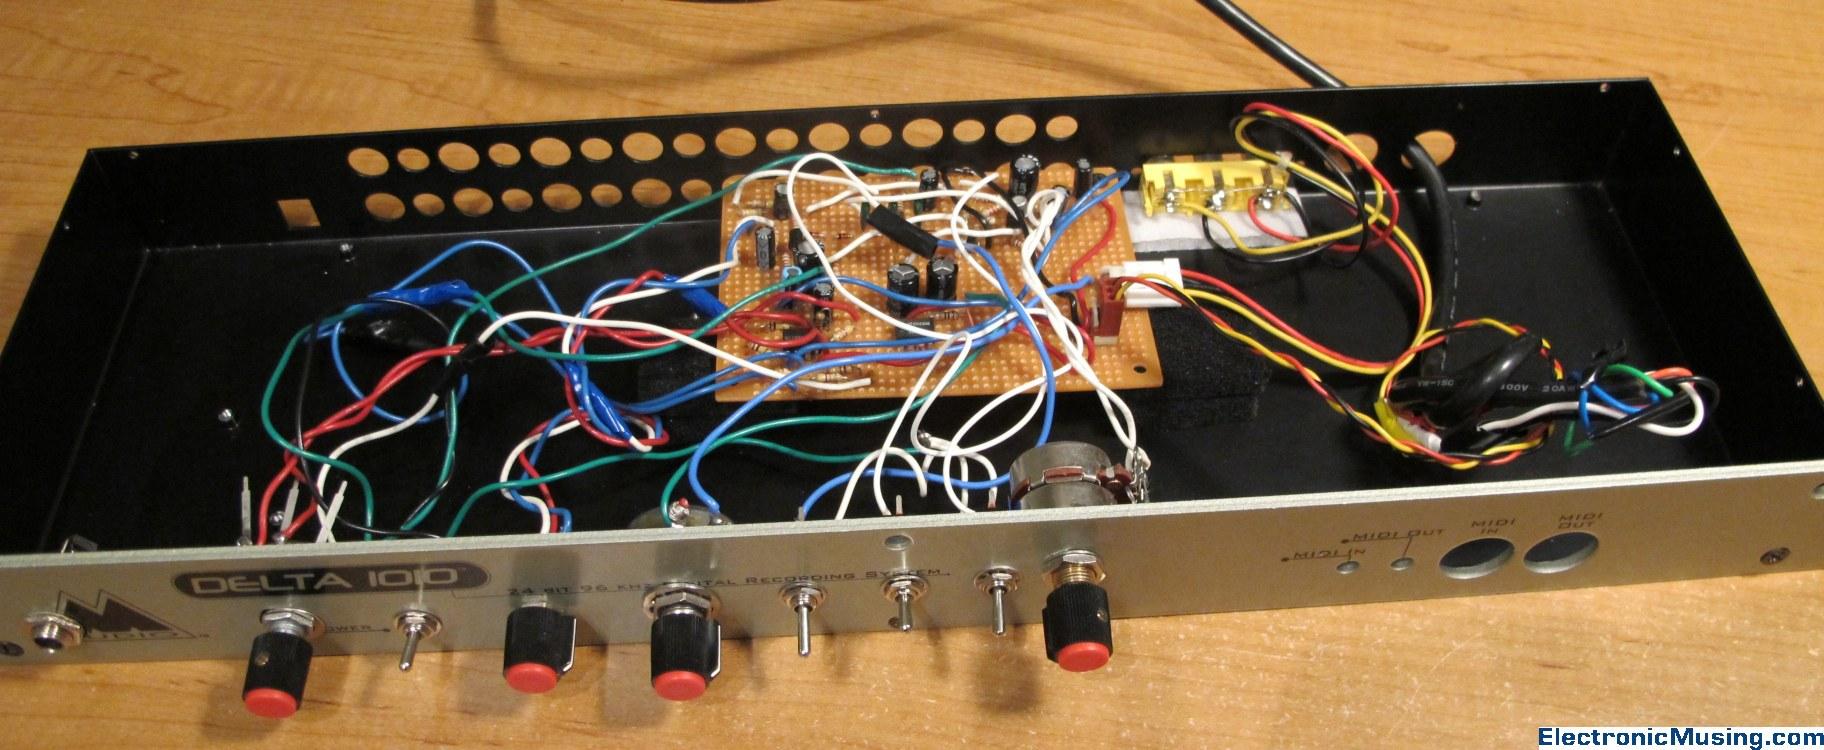 fender hot rod deluxe wiring diagram el thermo fan spring reverb tank schematic speaker ~ elsavadorla